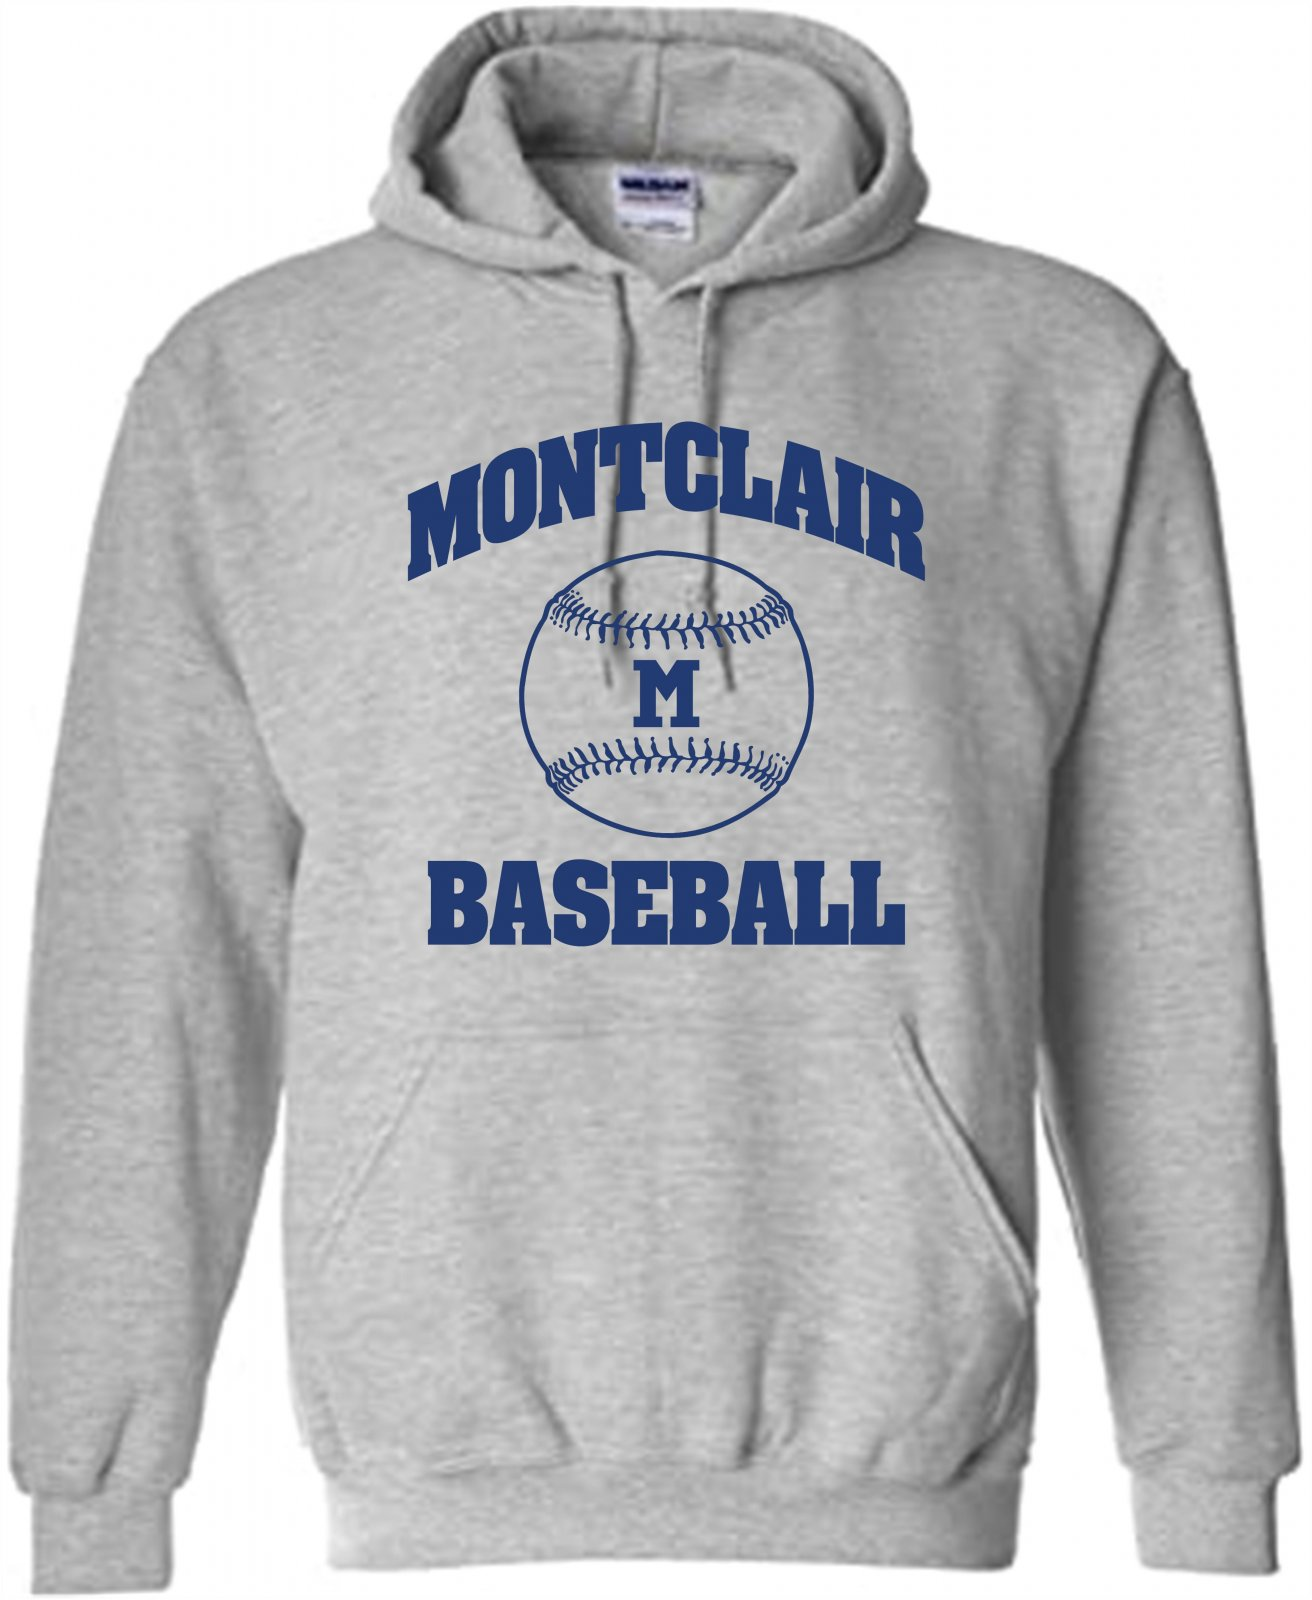 Gildan Montclair Baseball Hoodie